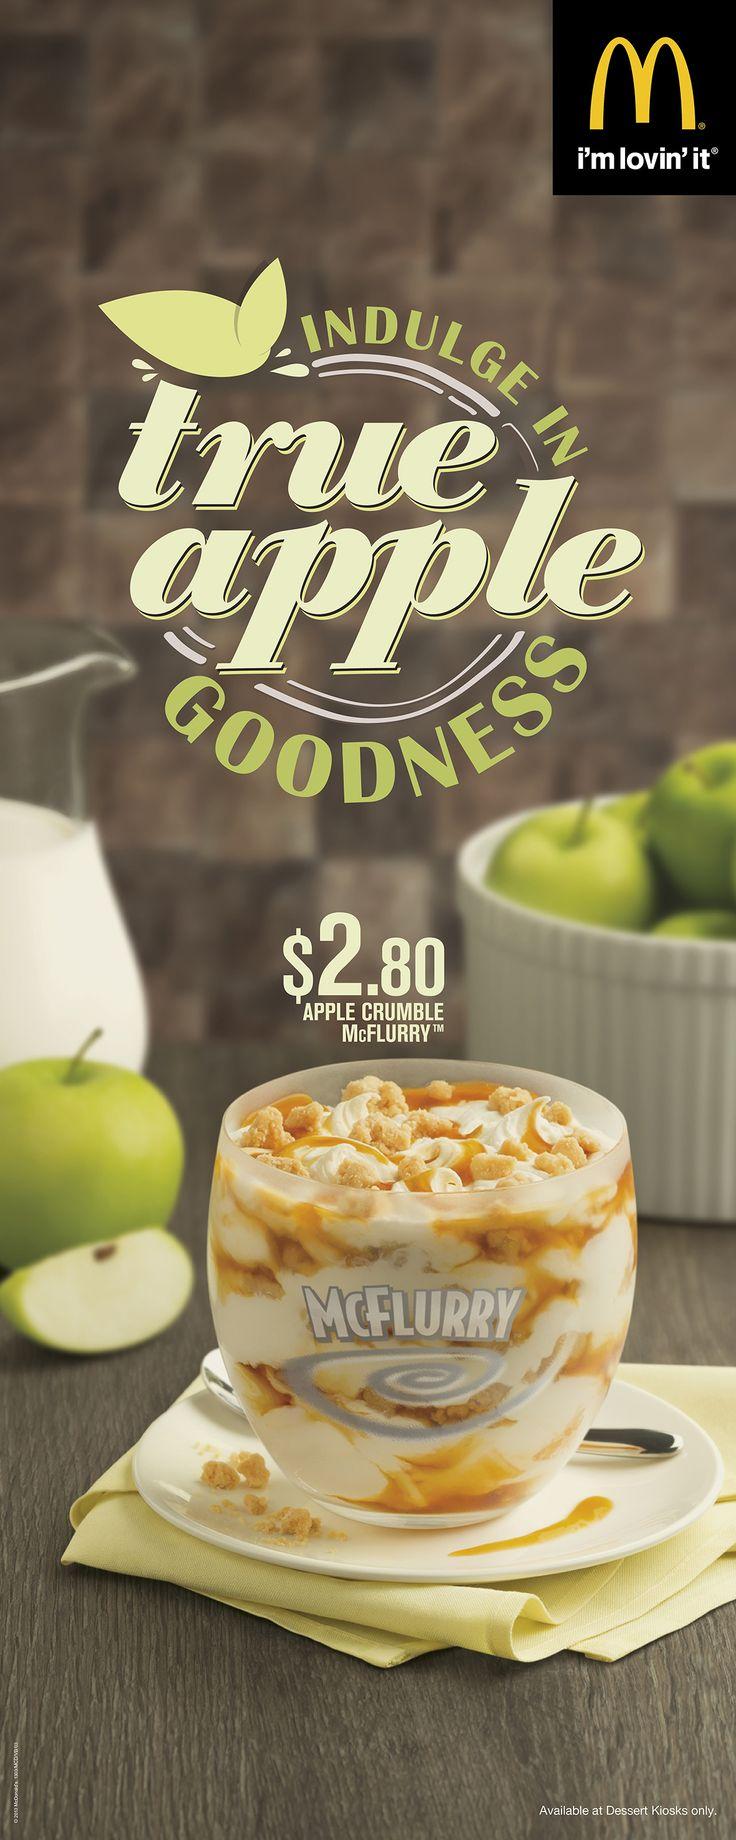 McDonald's Apple Crumble McFlurry